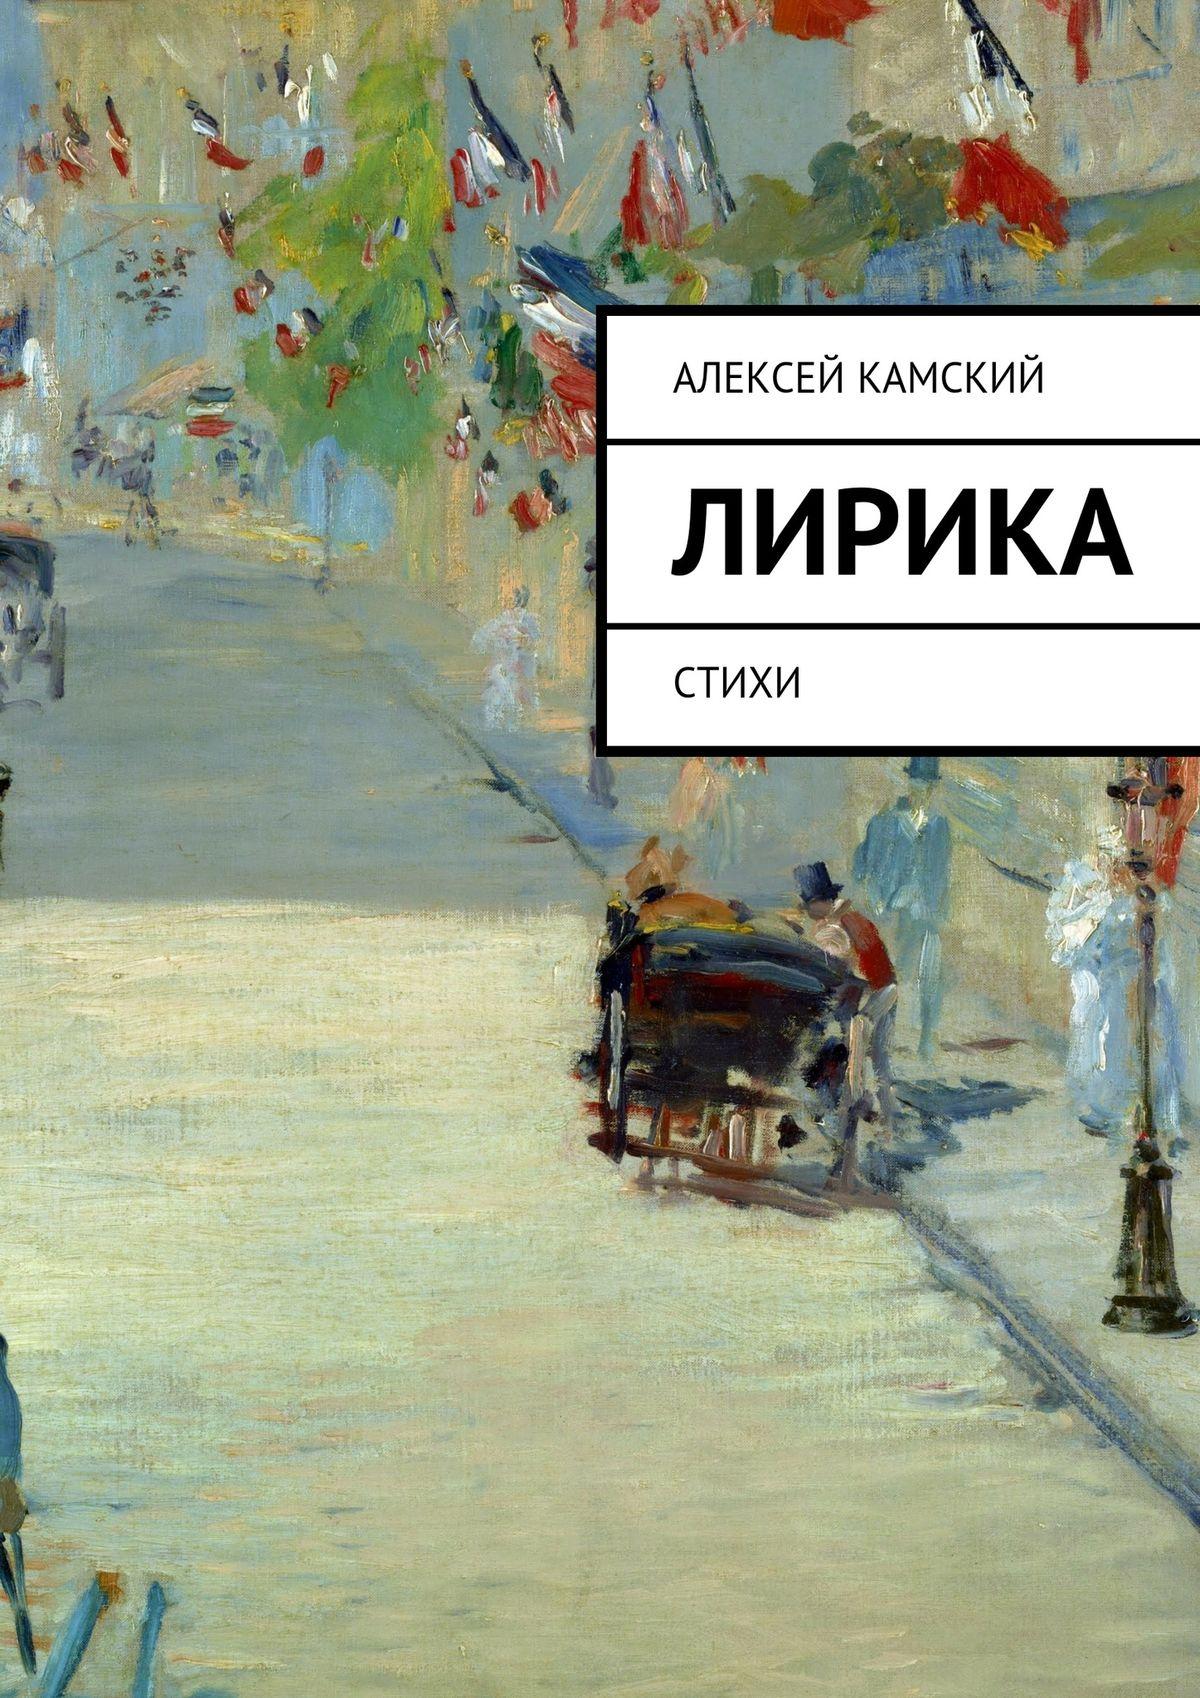 Алексей Камский Лирика. Стихи